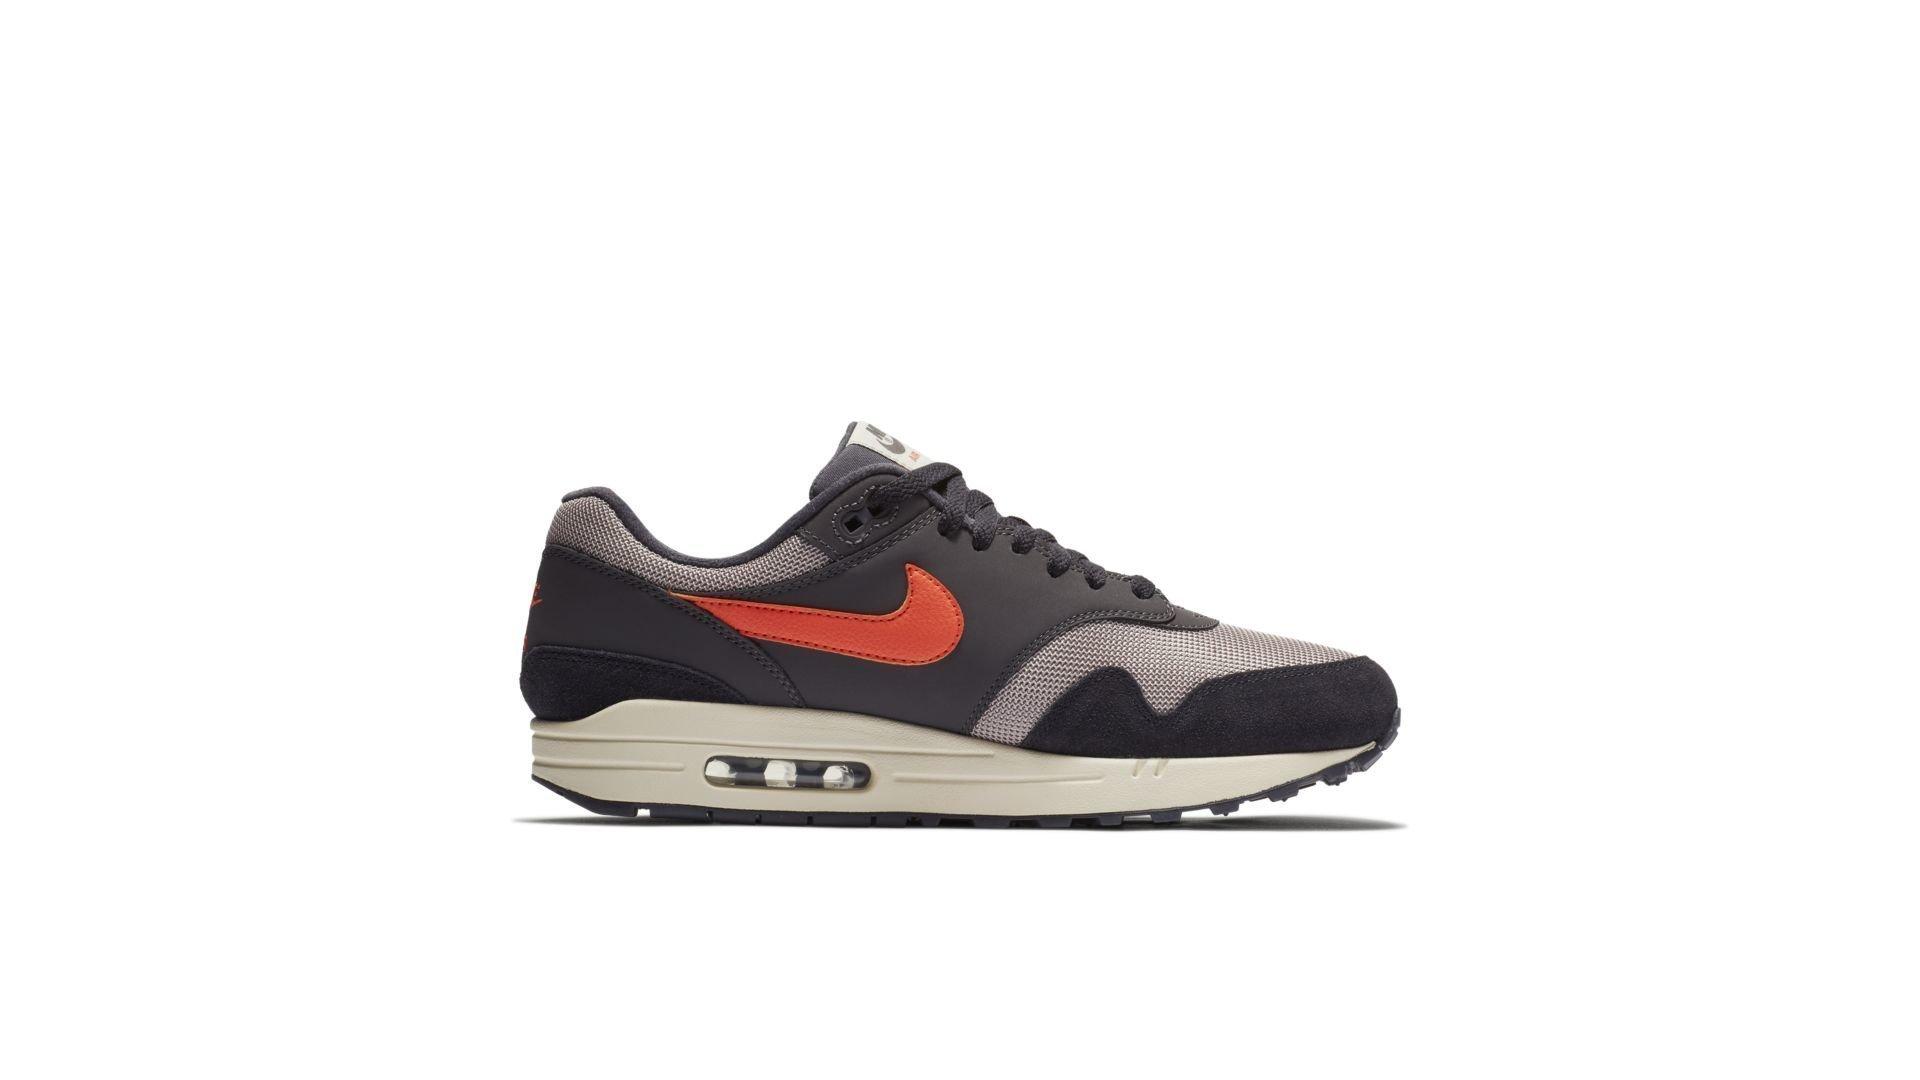 Nike Air Max 1 AH8145-004